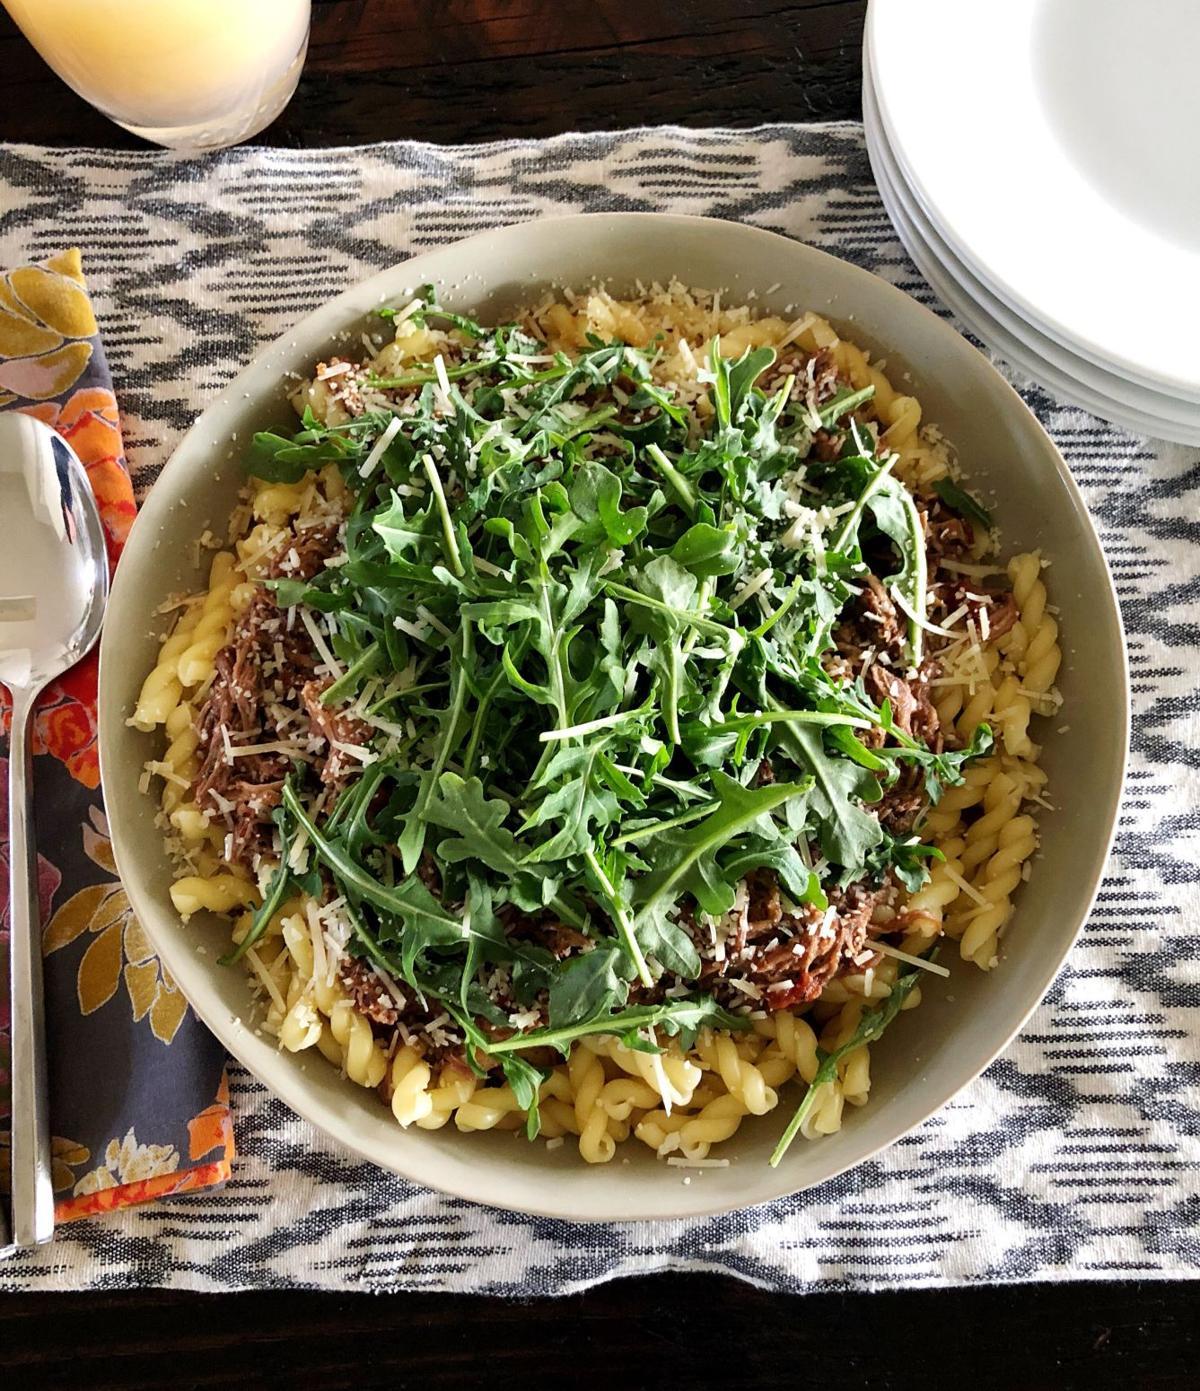 Kitchen Captivated - Pork Ragu with Pasta  and Arugula